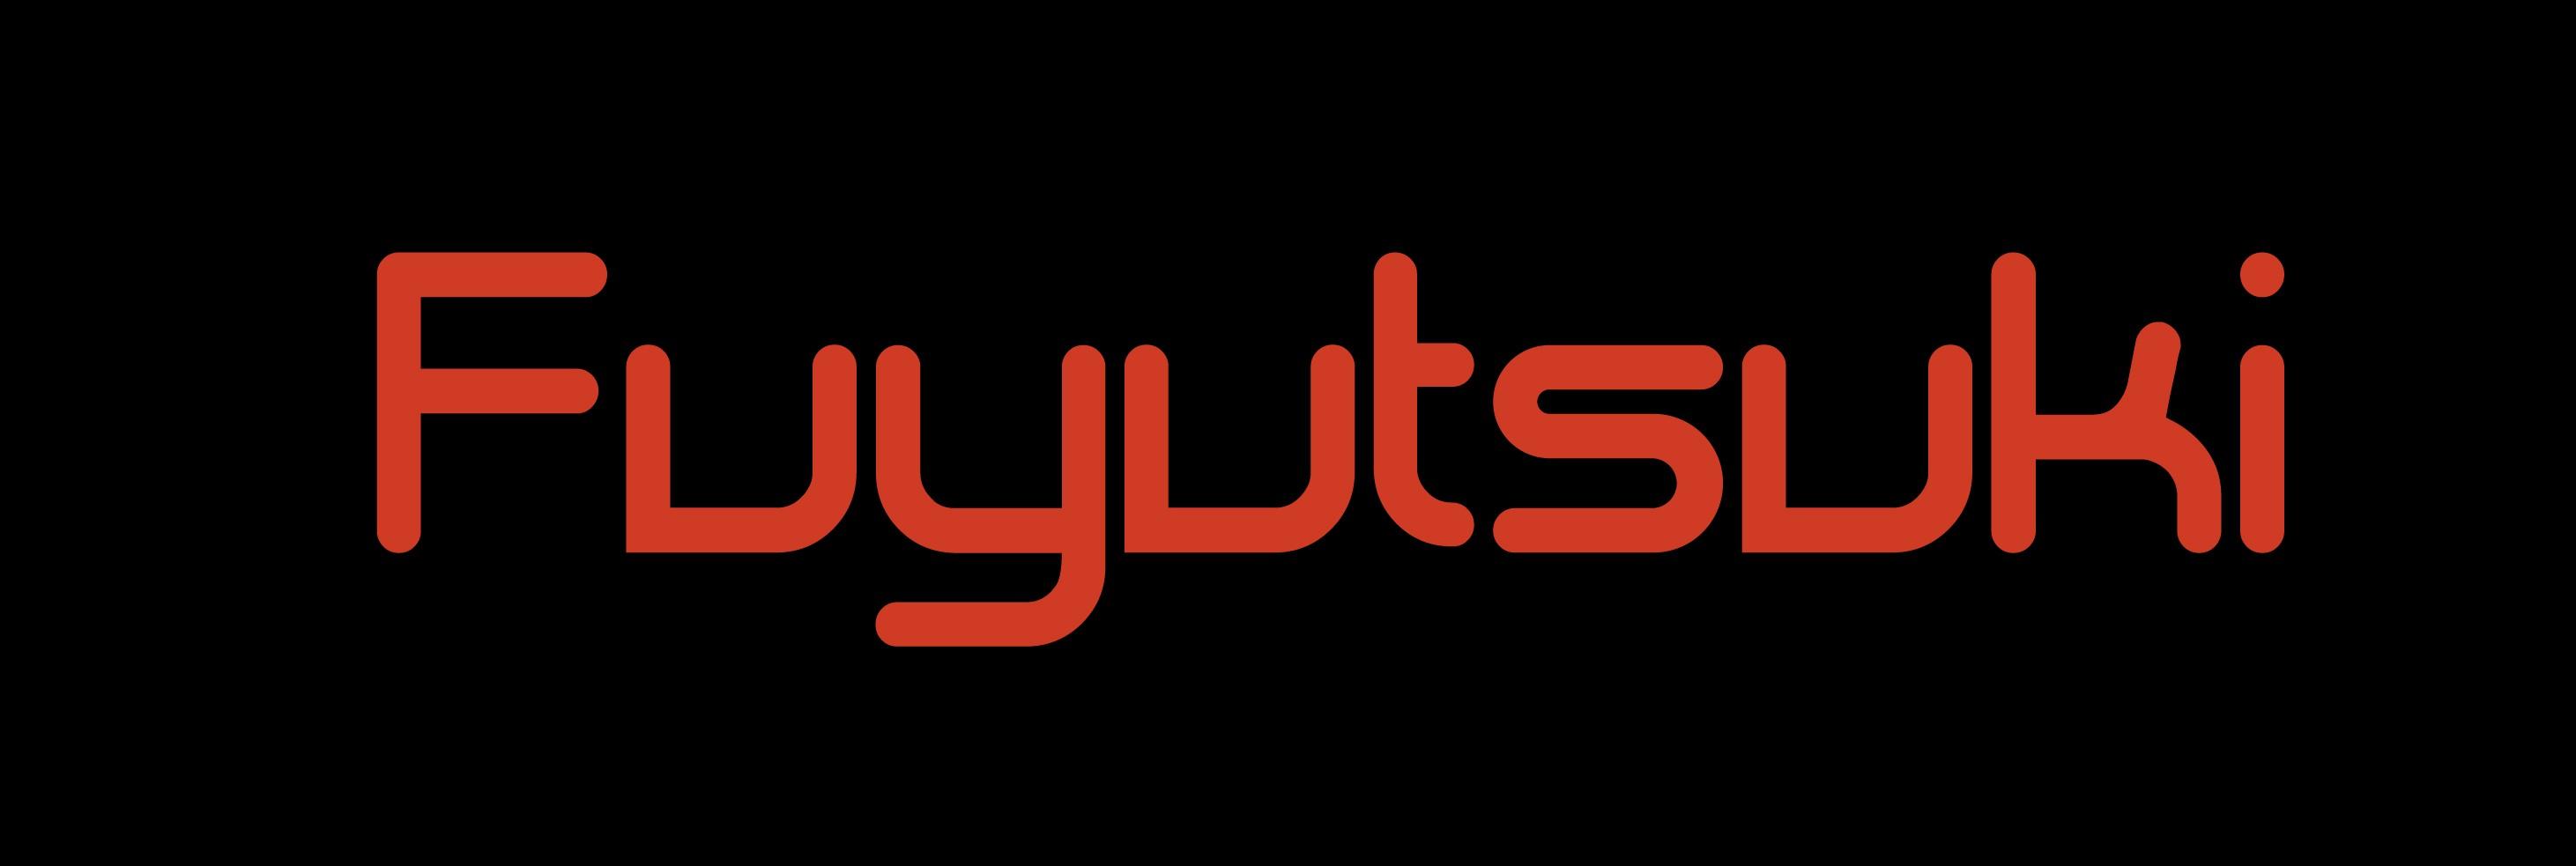 Fuyutsuki Electronics